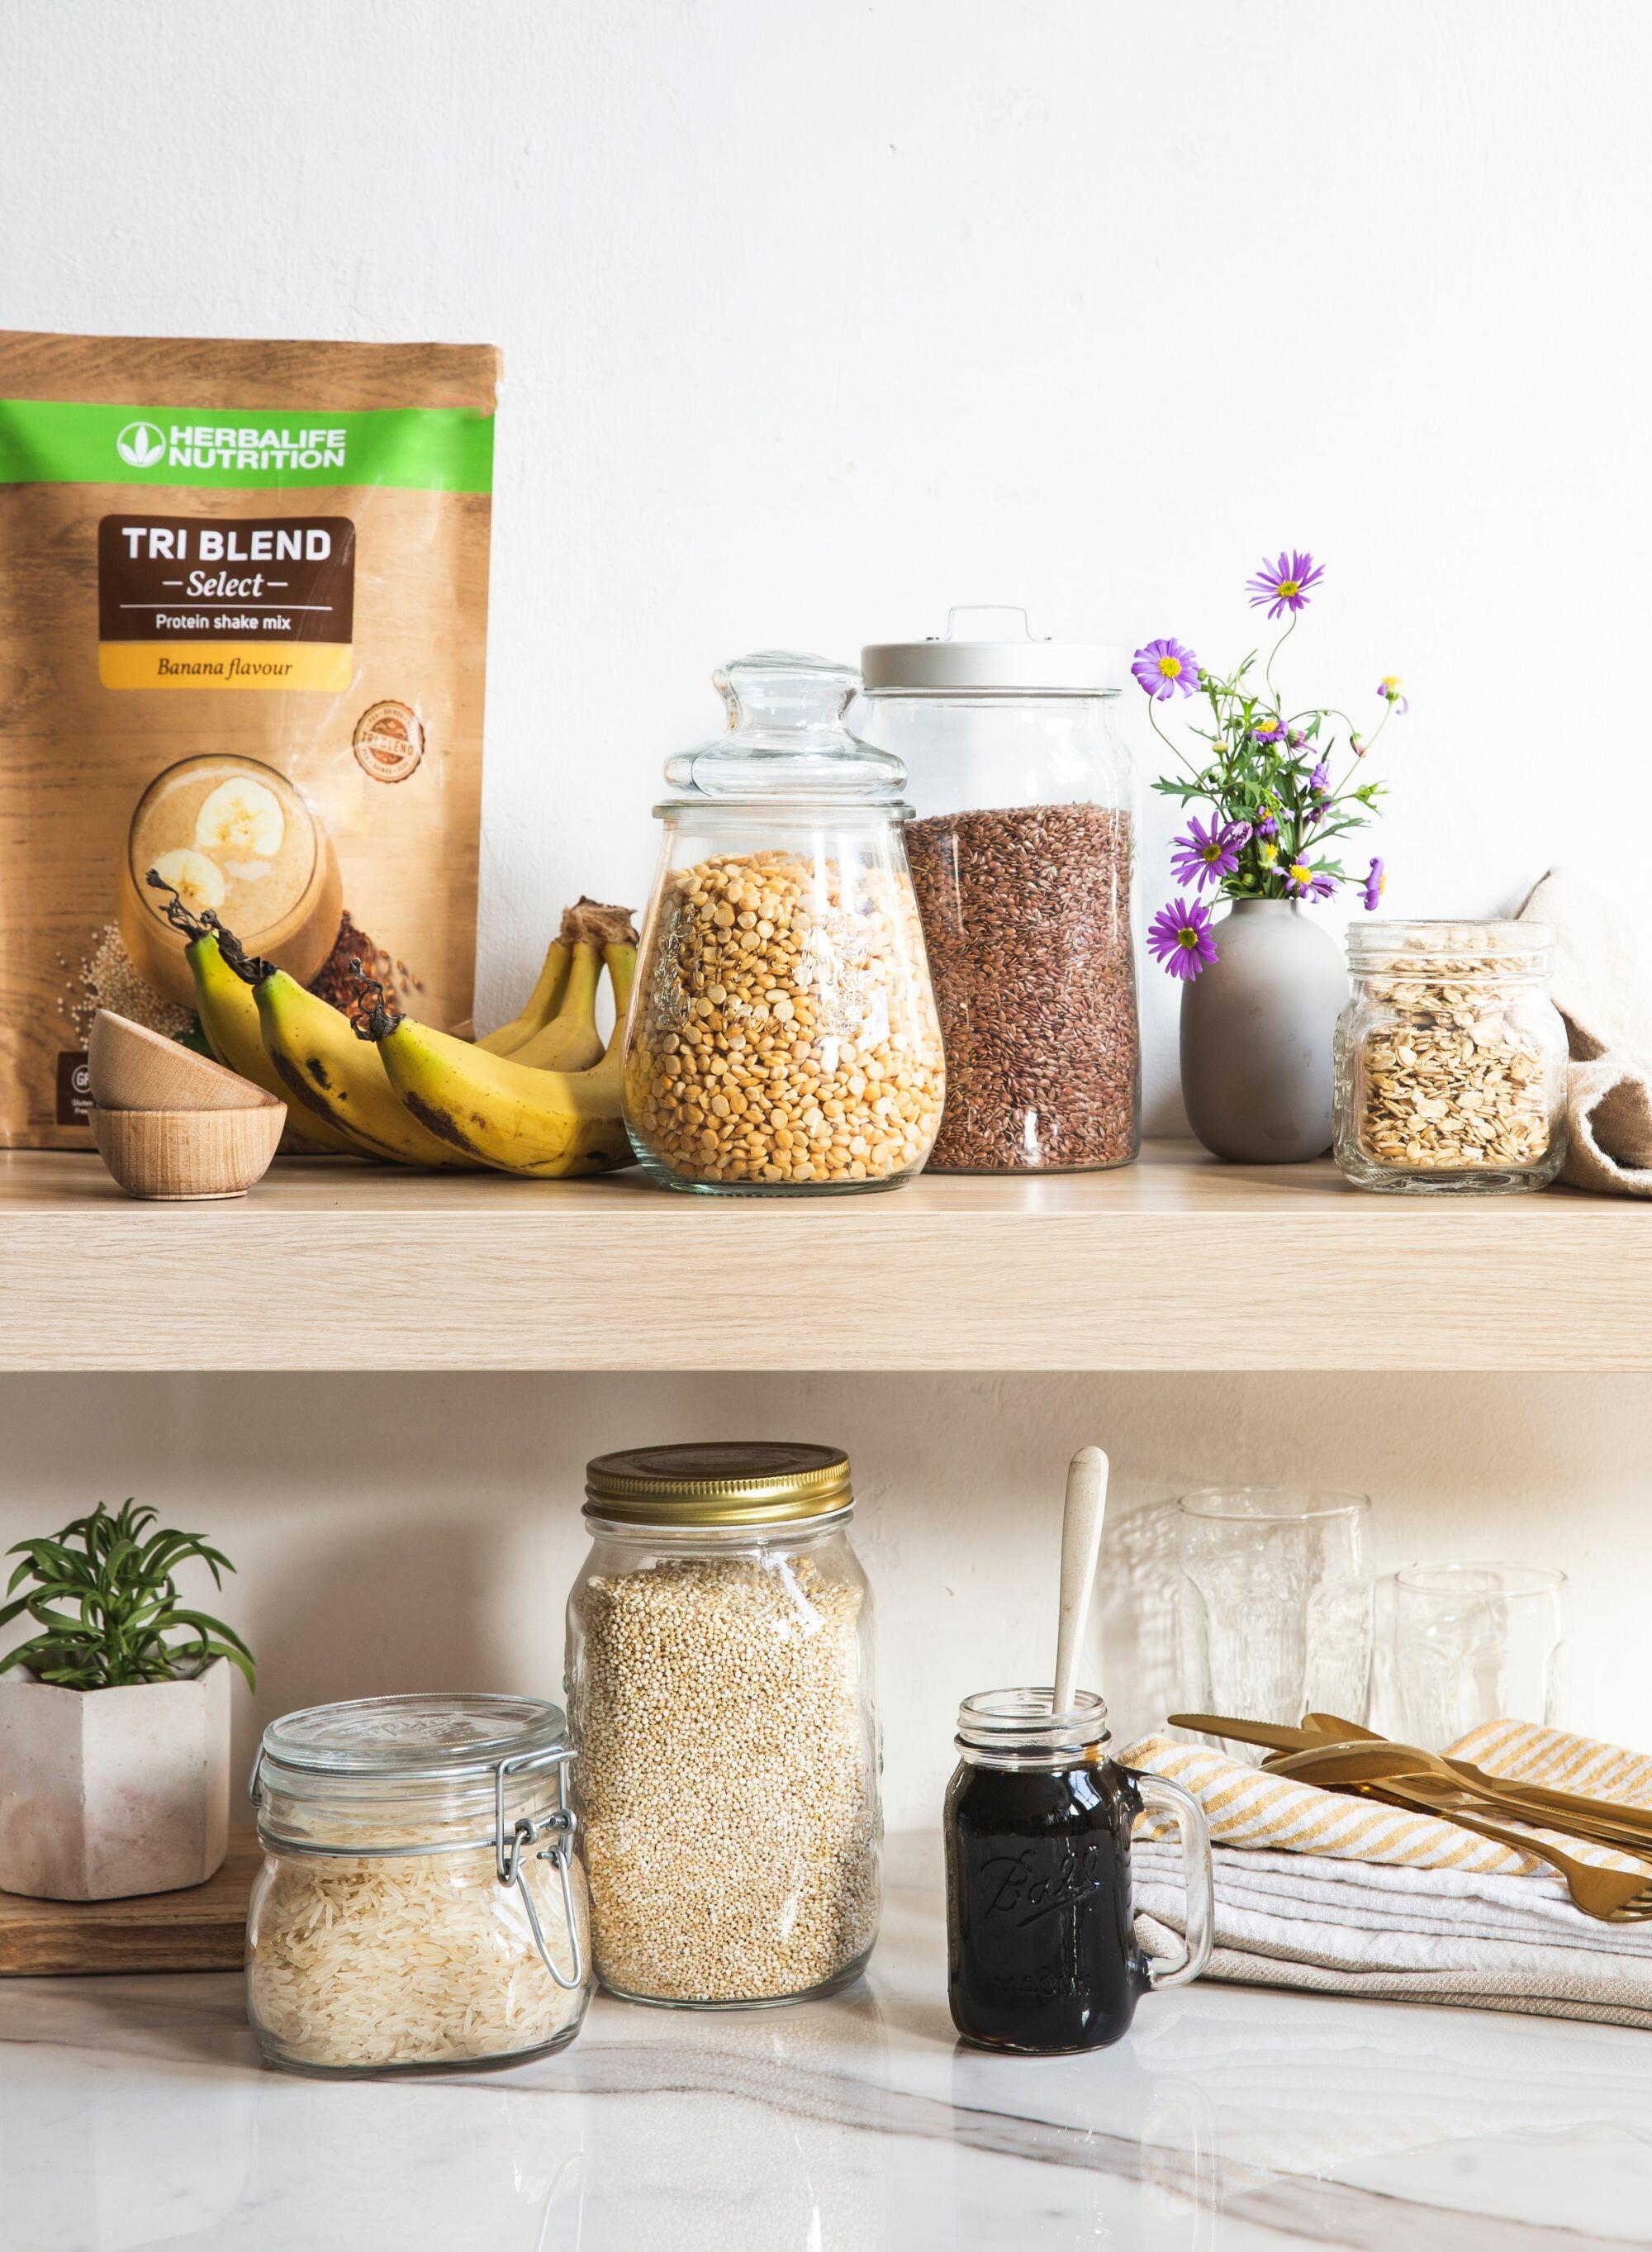 vegan-protein-shake-tri-blend-select.jpg